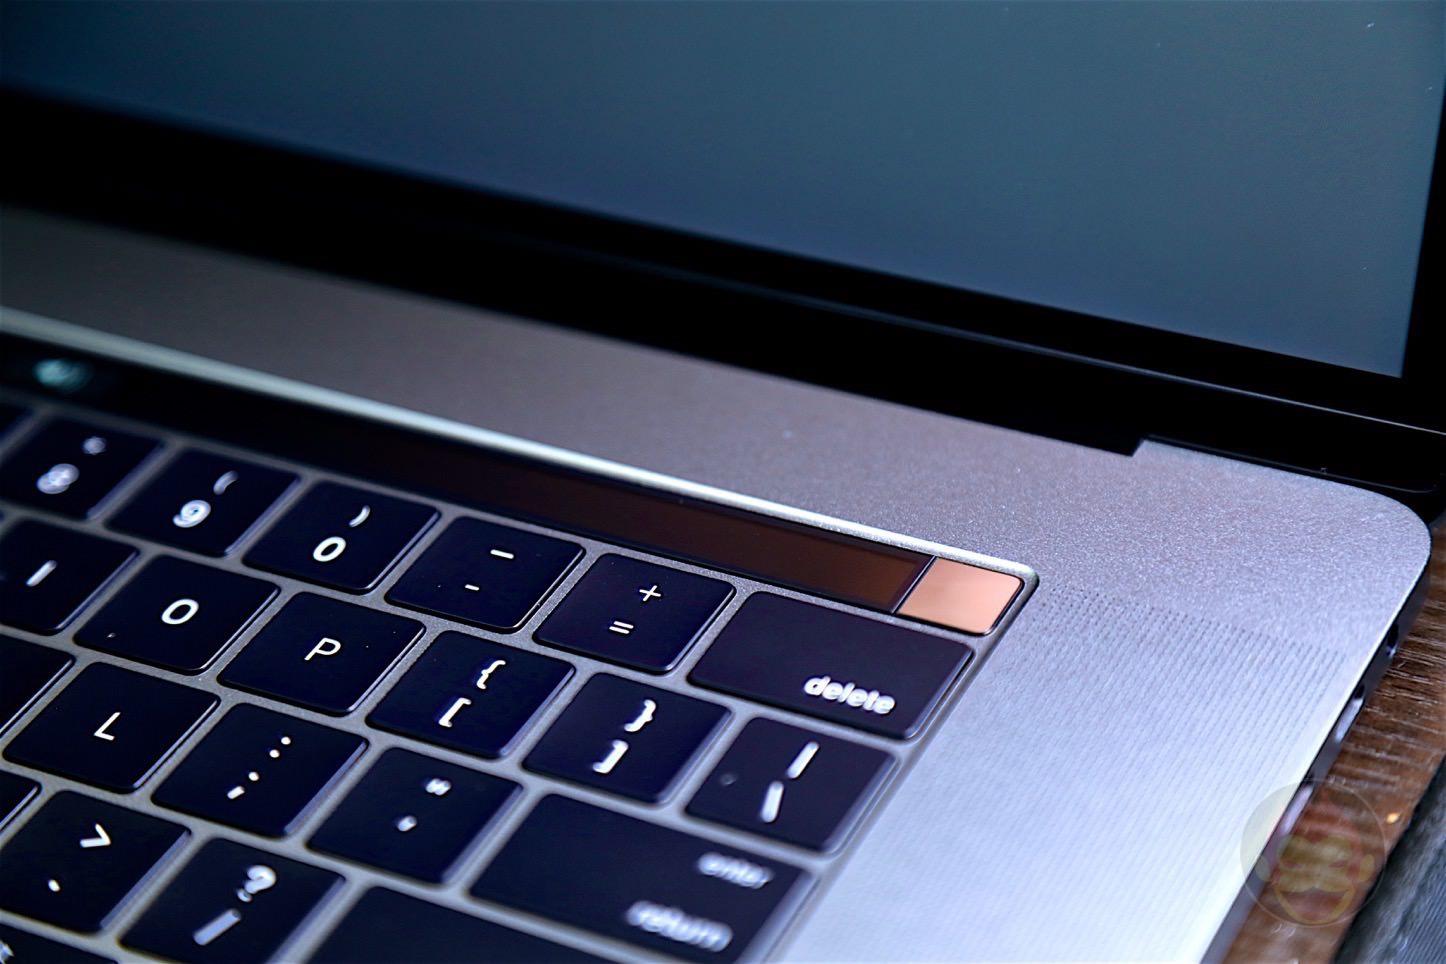 MacBook-Pro-Late-2016-15inch-model-15.jpg